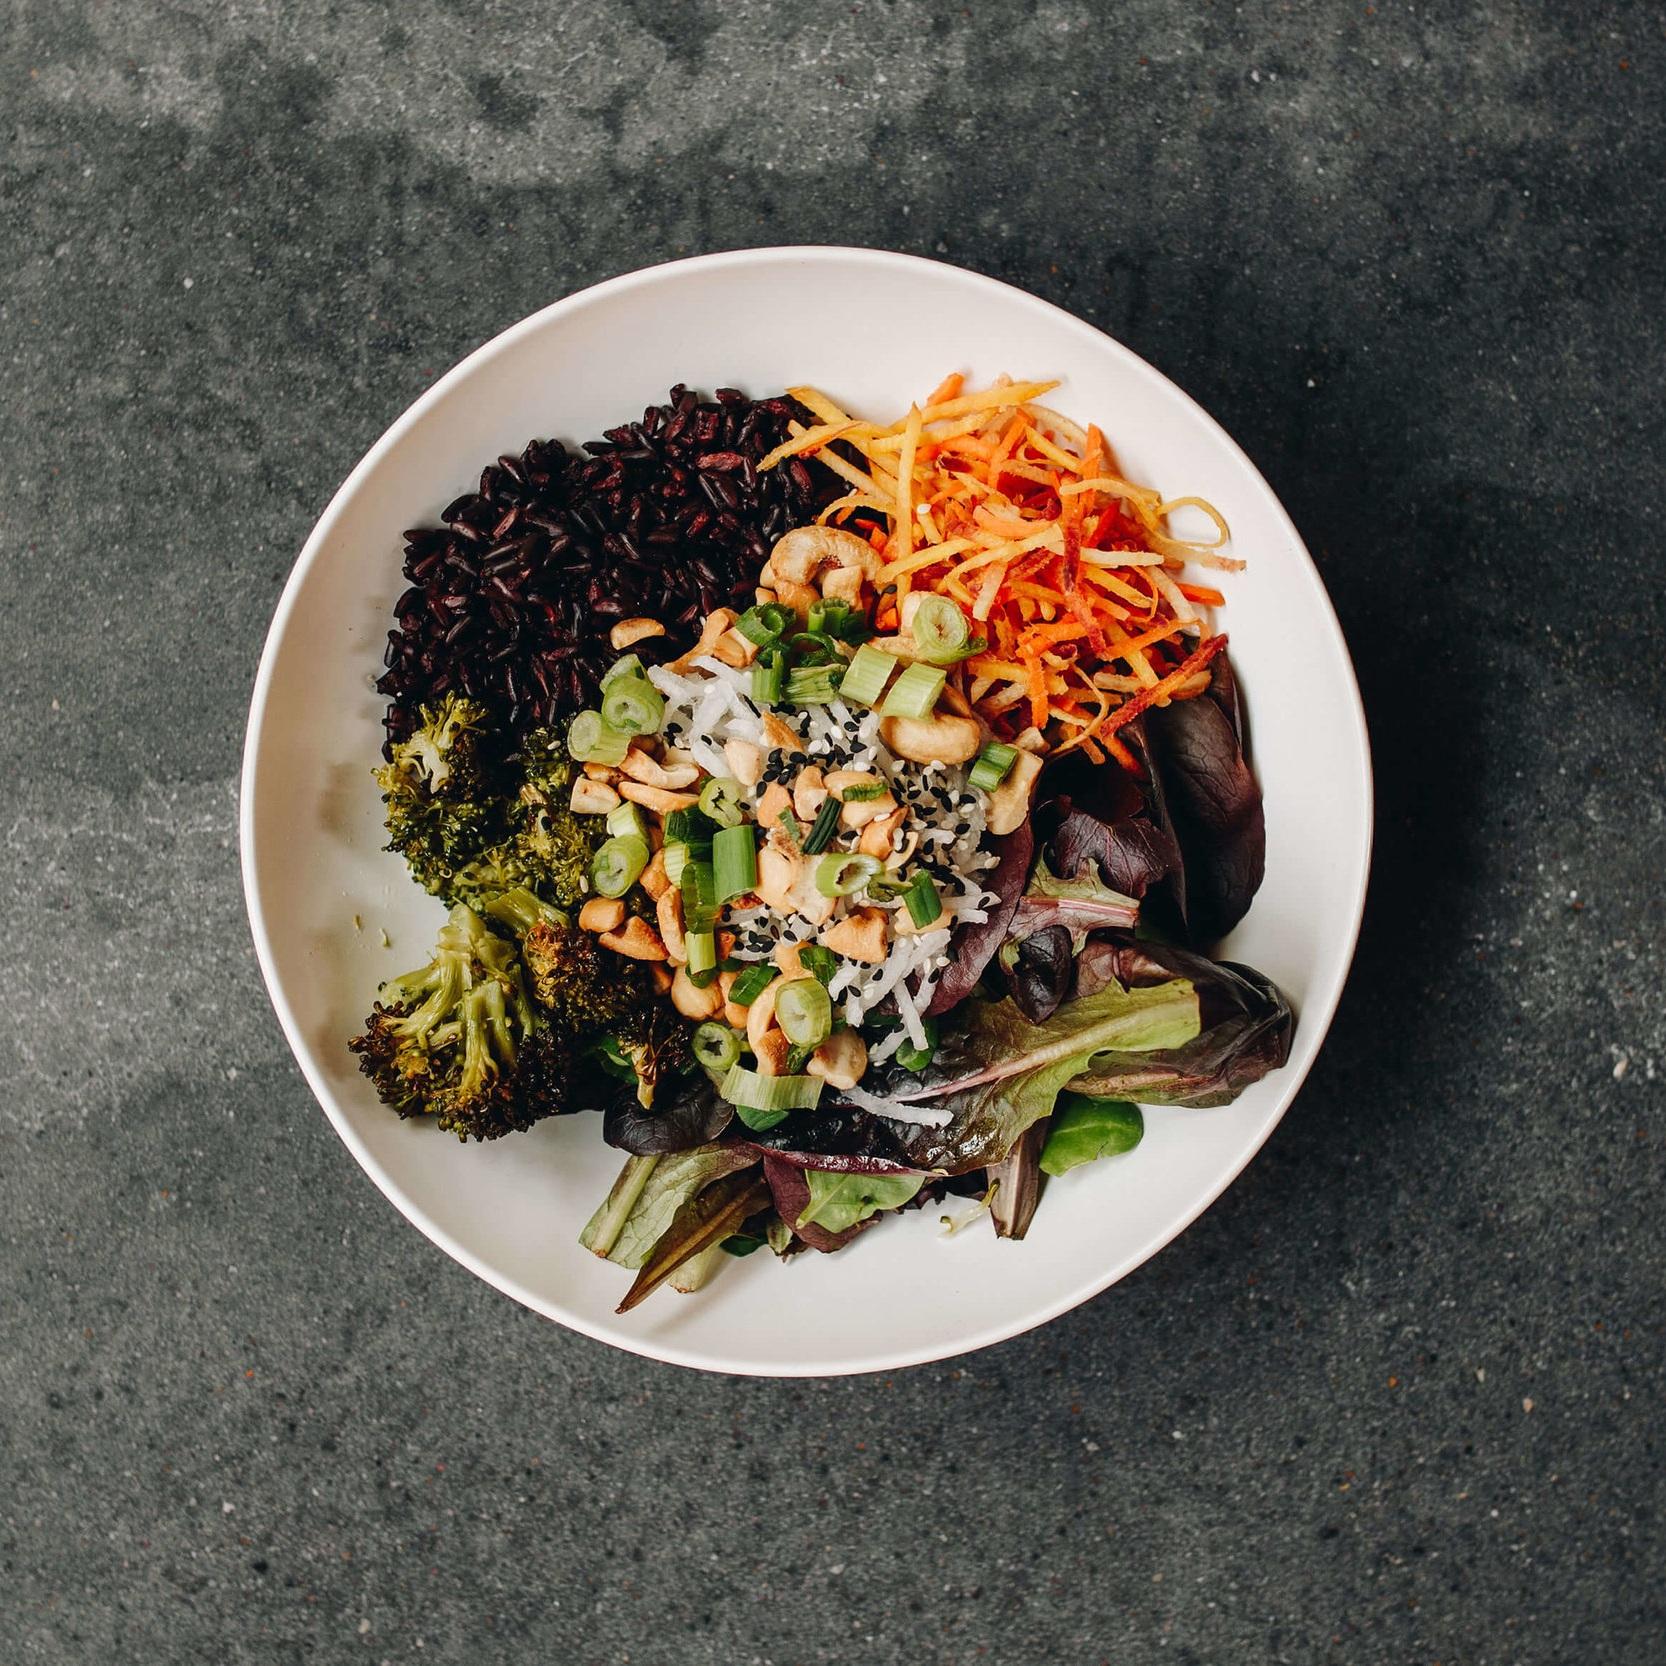 Thai Cashew Bowl - Mixed greens, black rice, radish, rainbow carrot, broccoli, sunflower sprouts, green onion, cilantro, roasted cashews, sesame seeds, Thai cashew dressing9.00